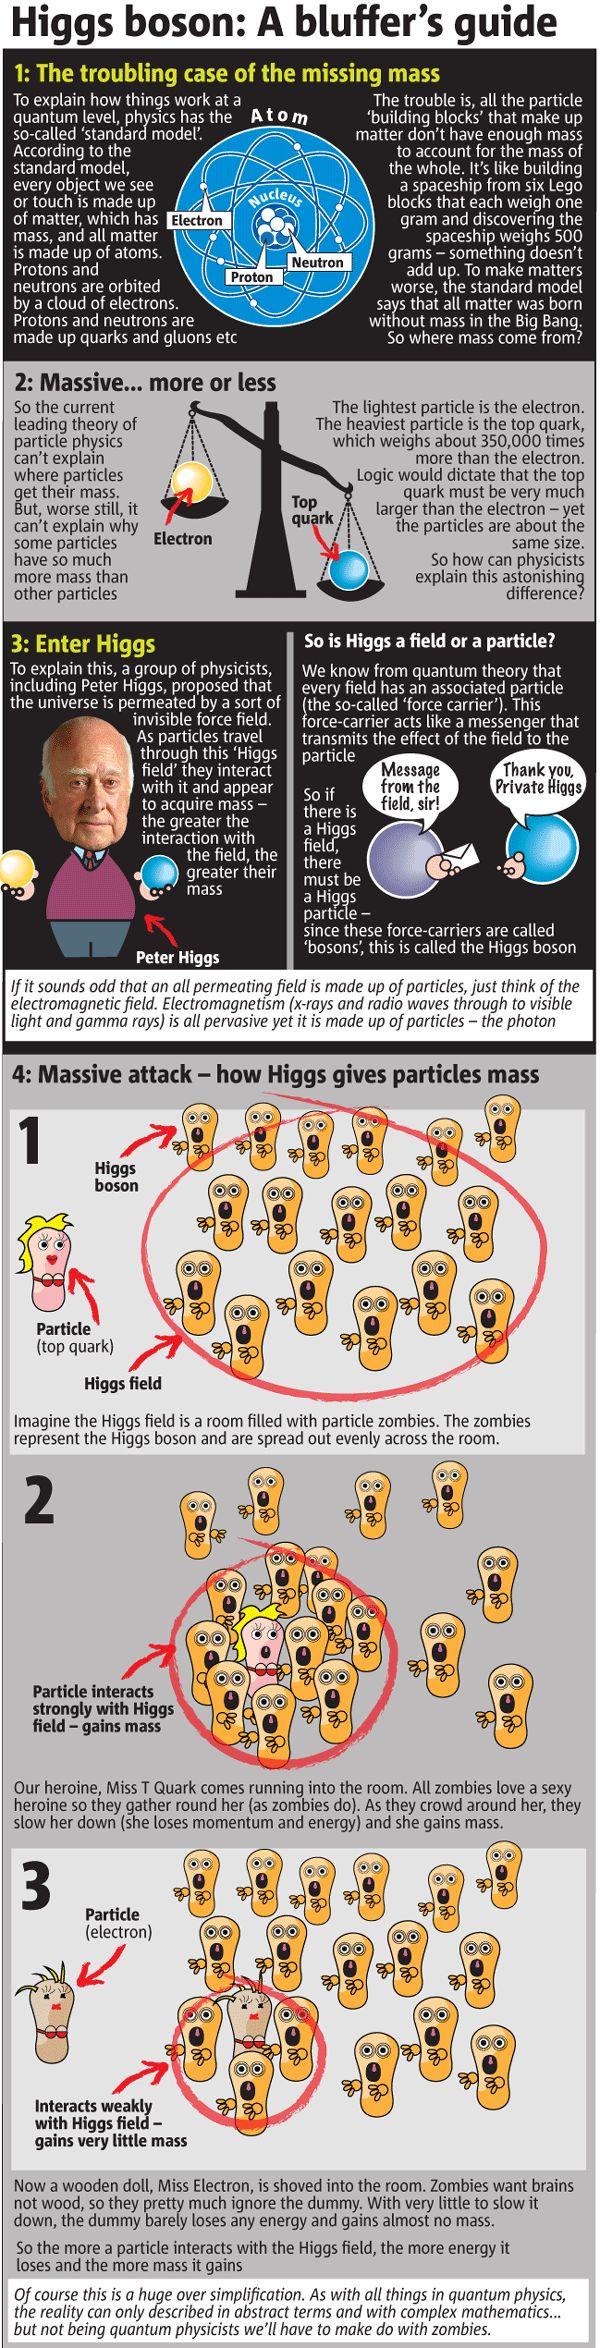 Higgs | CosmOnline via http://rangle.tumblr.com/post/26336680482/closing-in-on-the-god-damn-it-jim-im-a via @peppeliberti